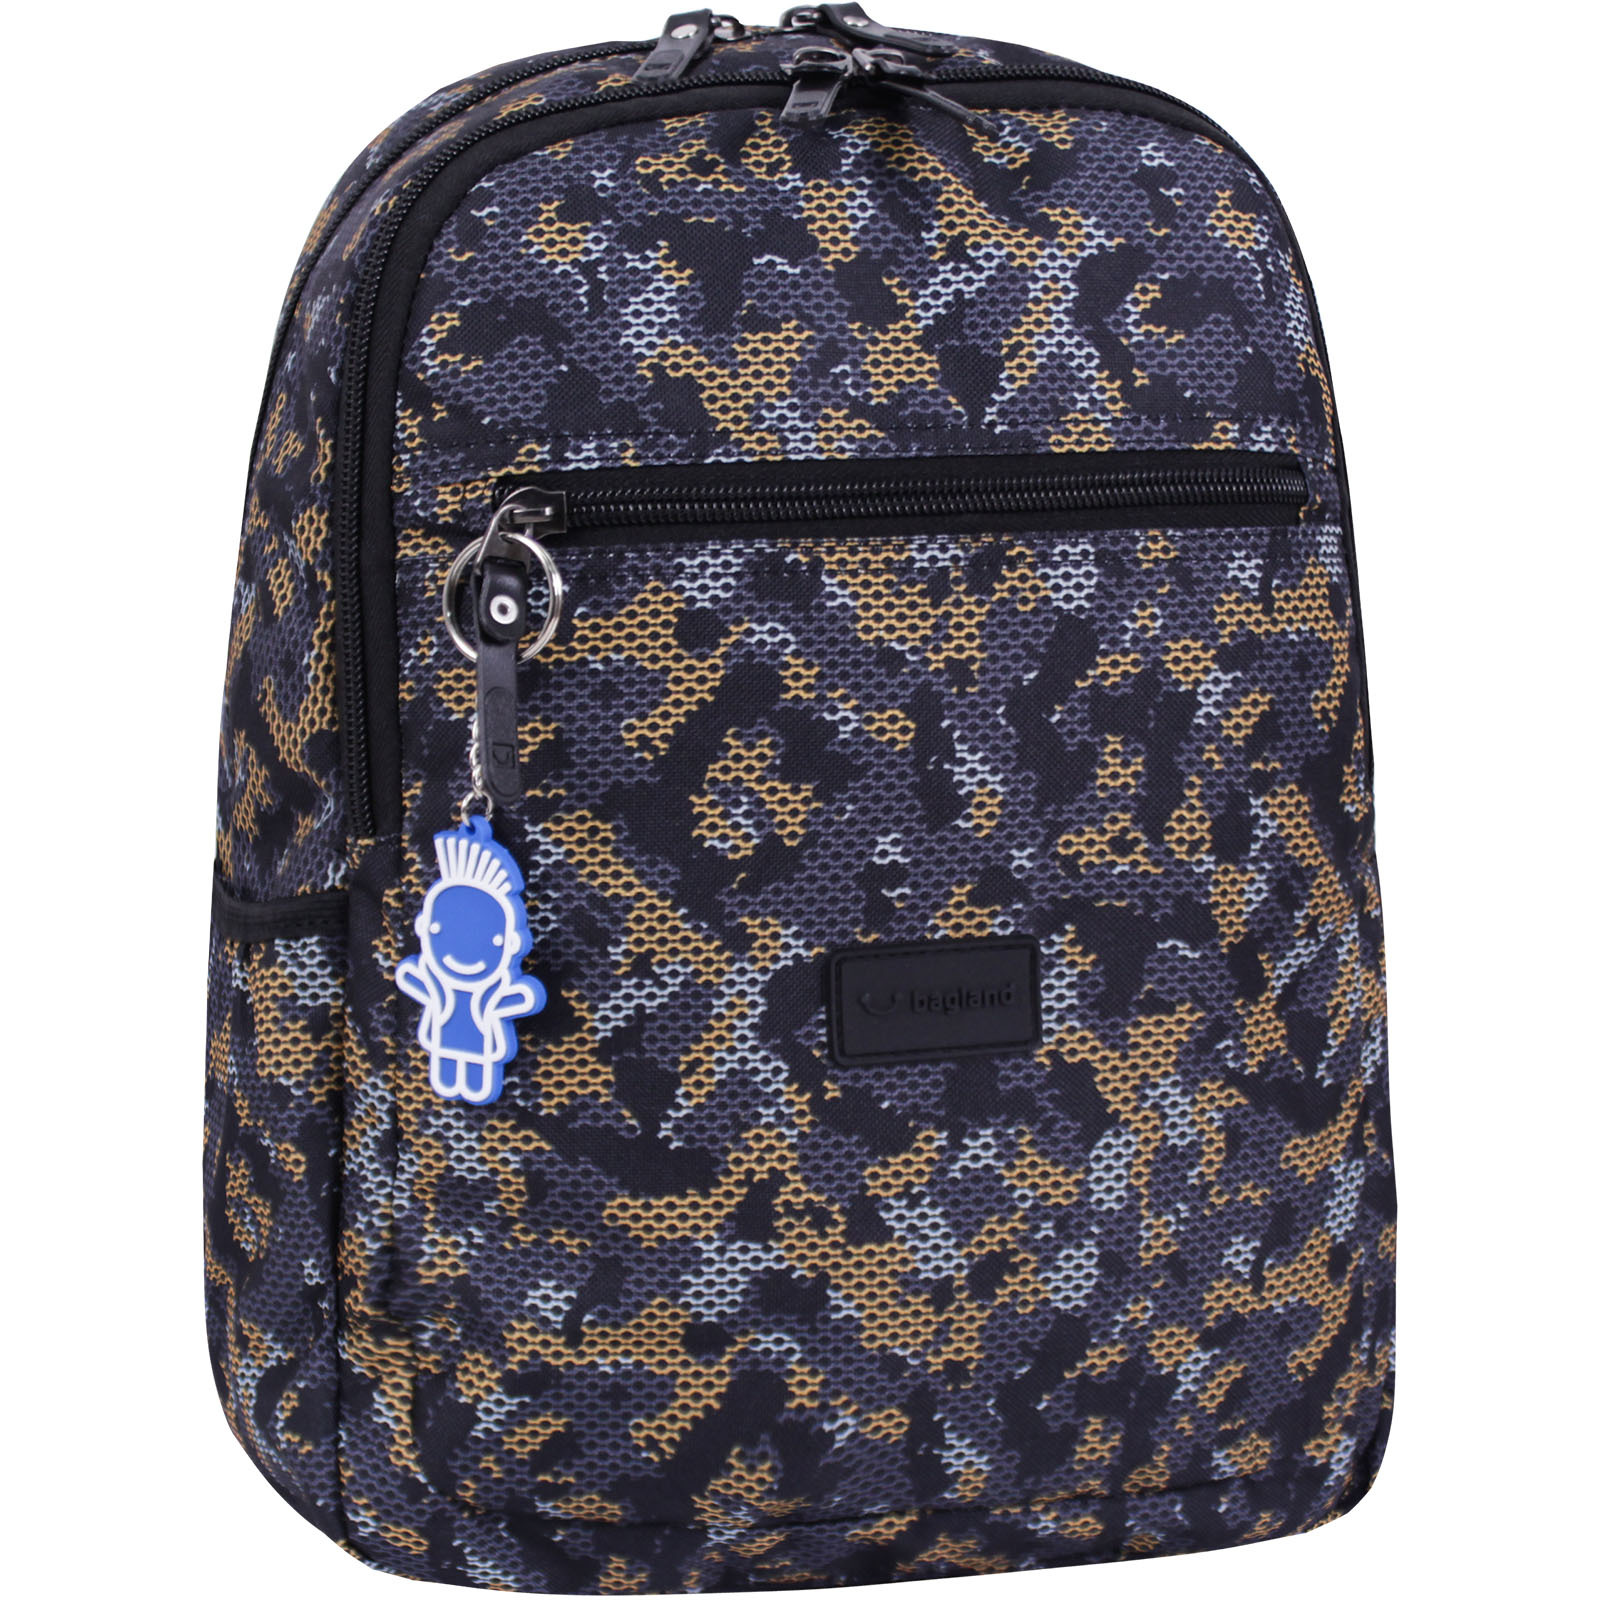 Детские рюкзаки Рюкзак Bagland Young 13 л. сублімація 455 (00510664) IMG_7924-1600-455.jpg